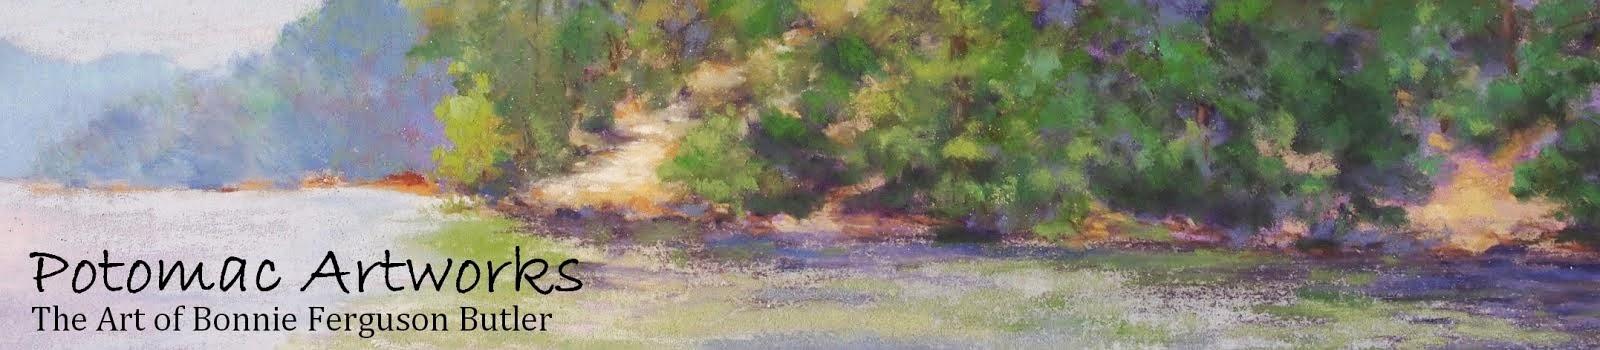 Potomac Artworks